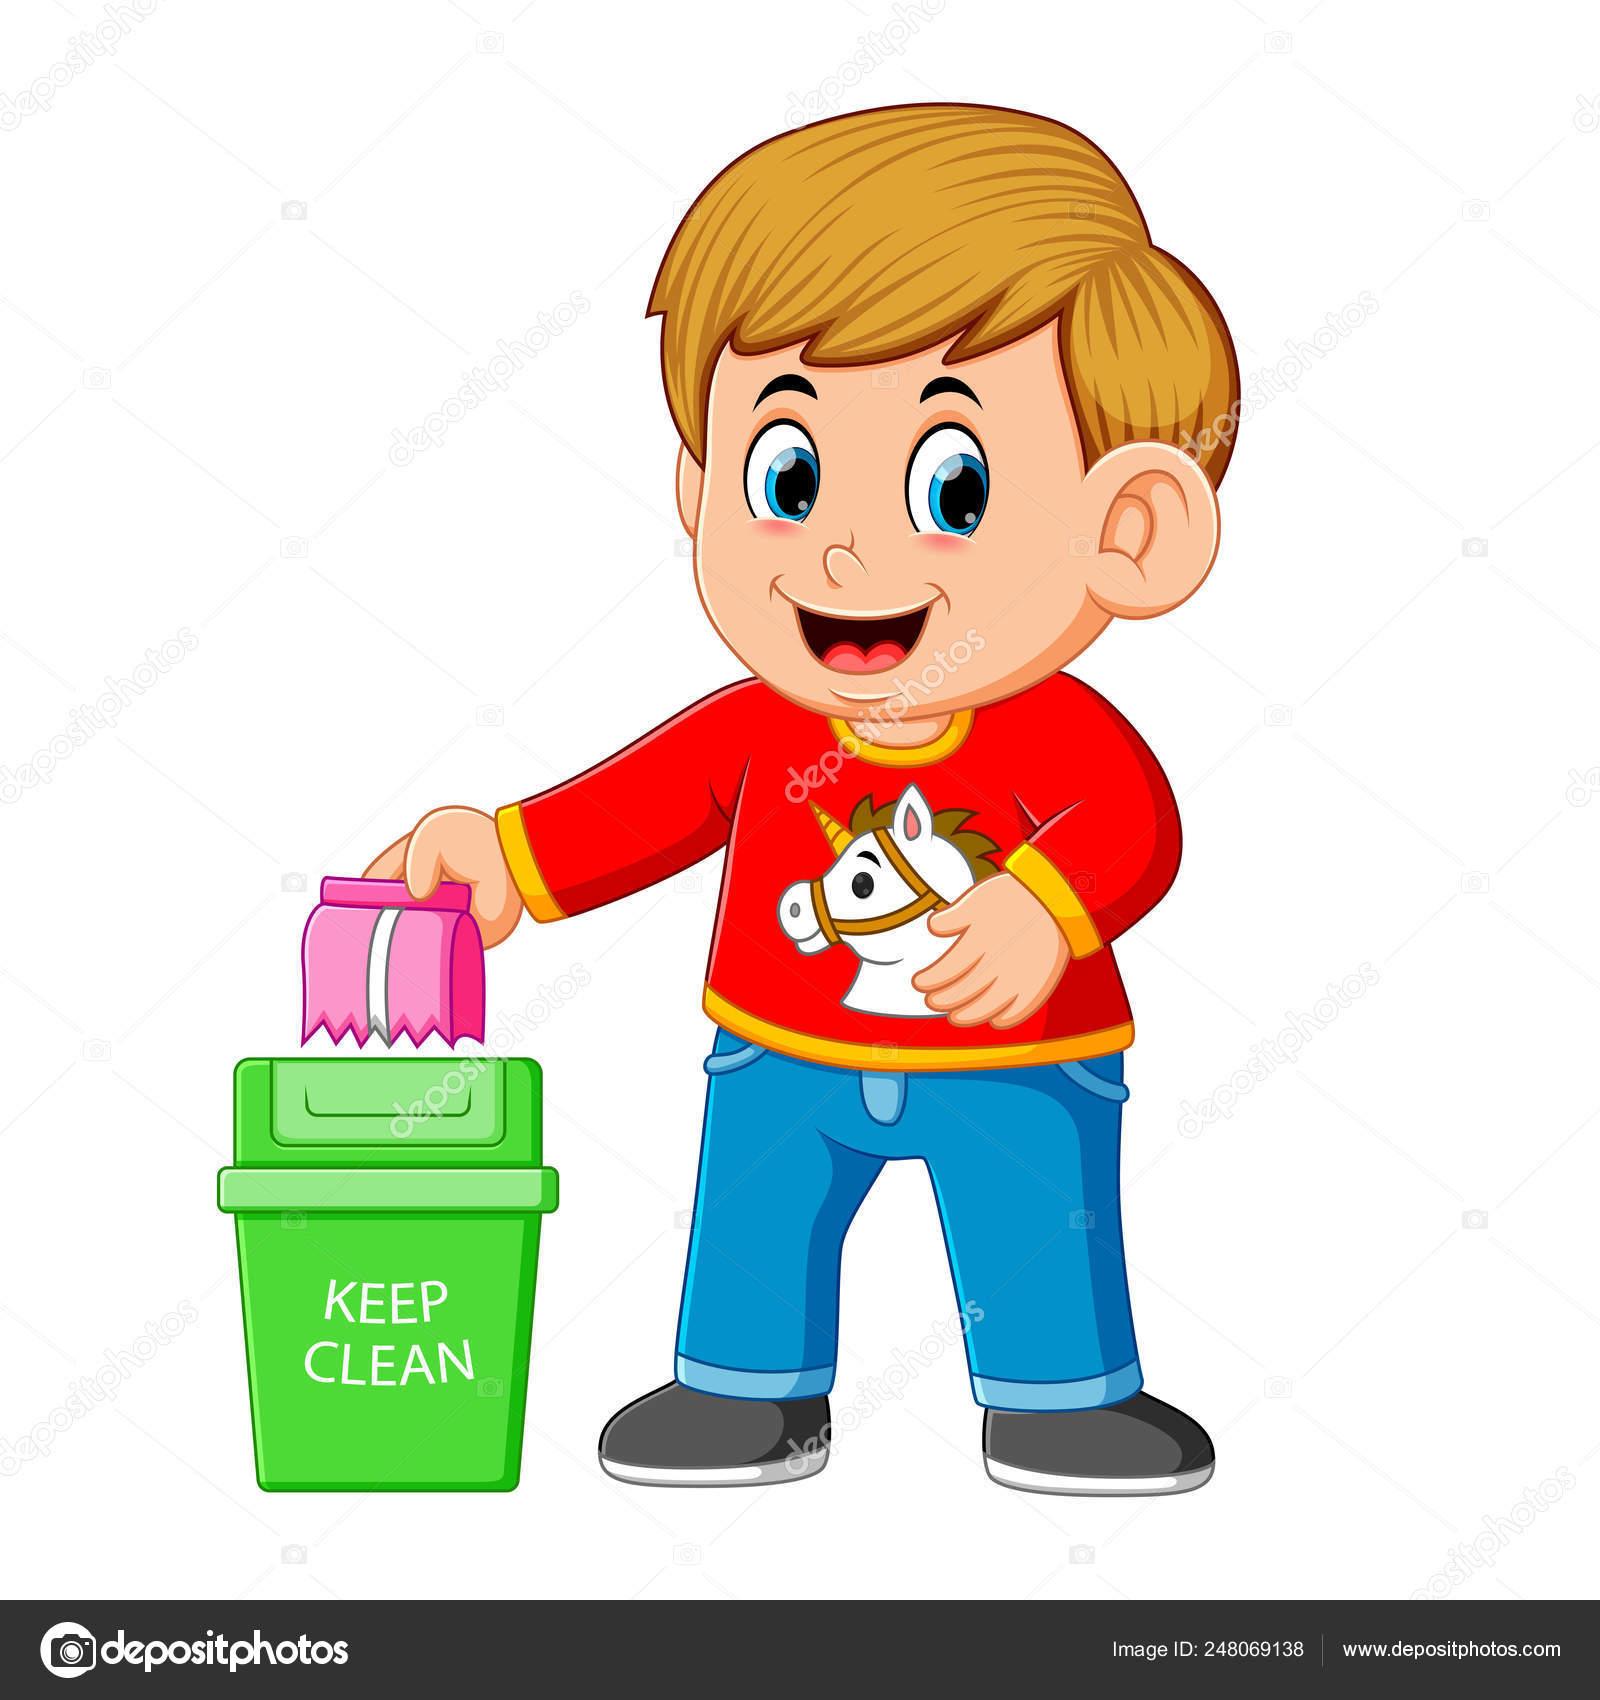 Personal hygiene for children: in pictures | Raising Children Network